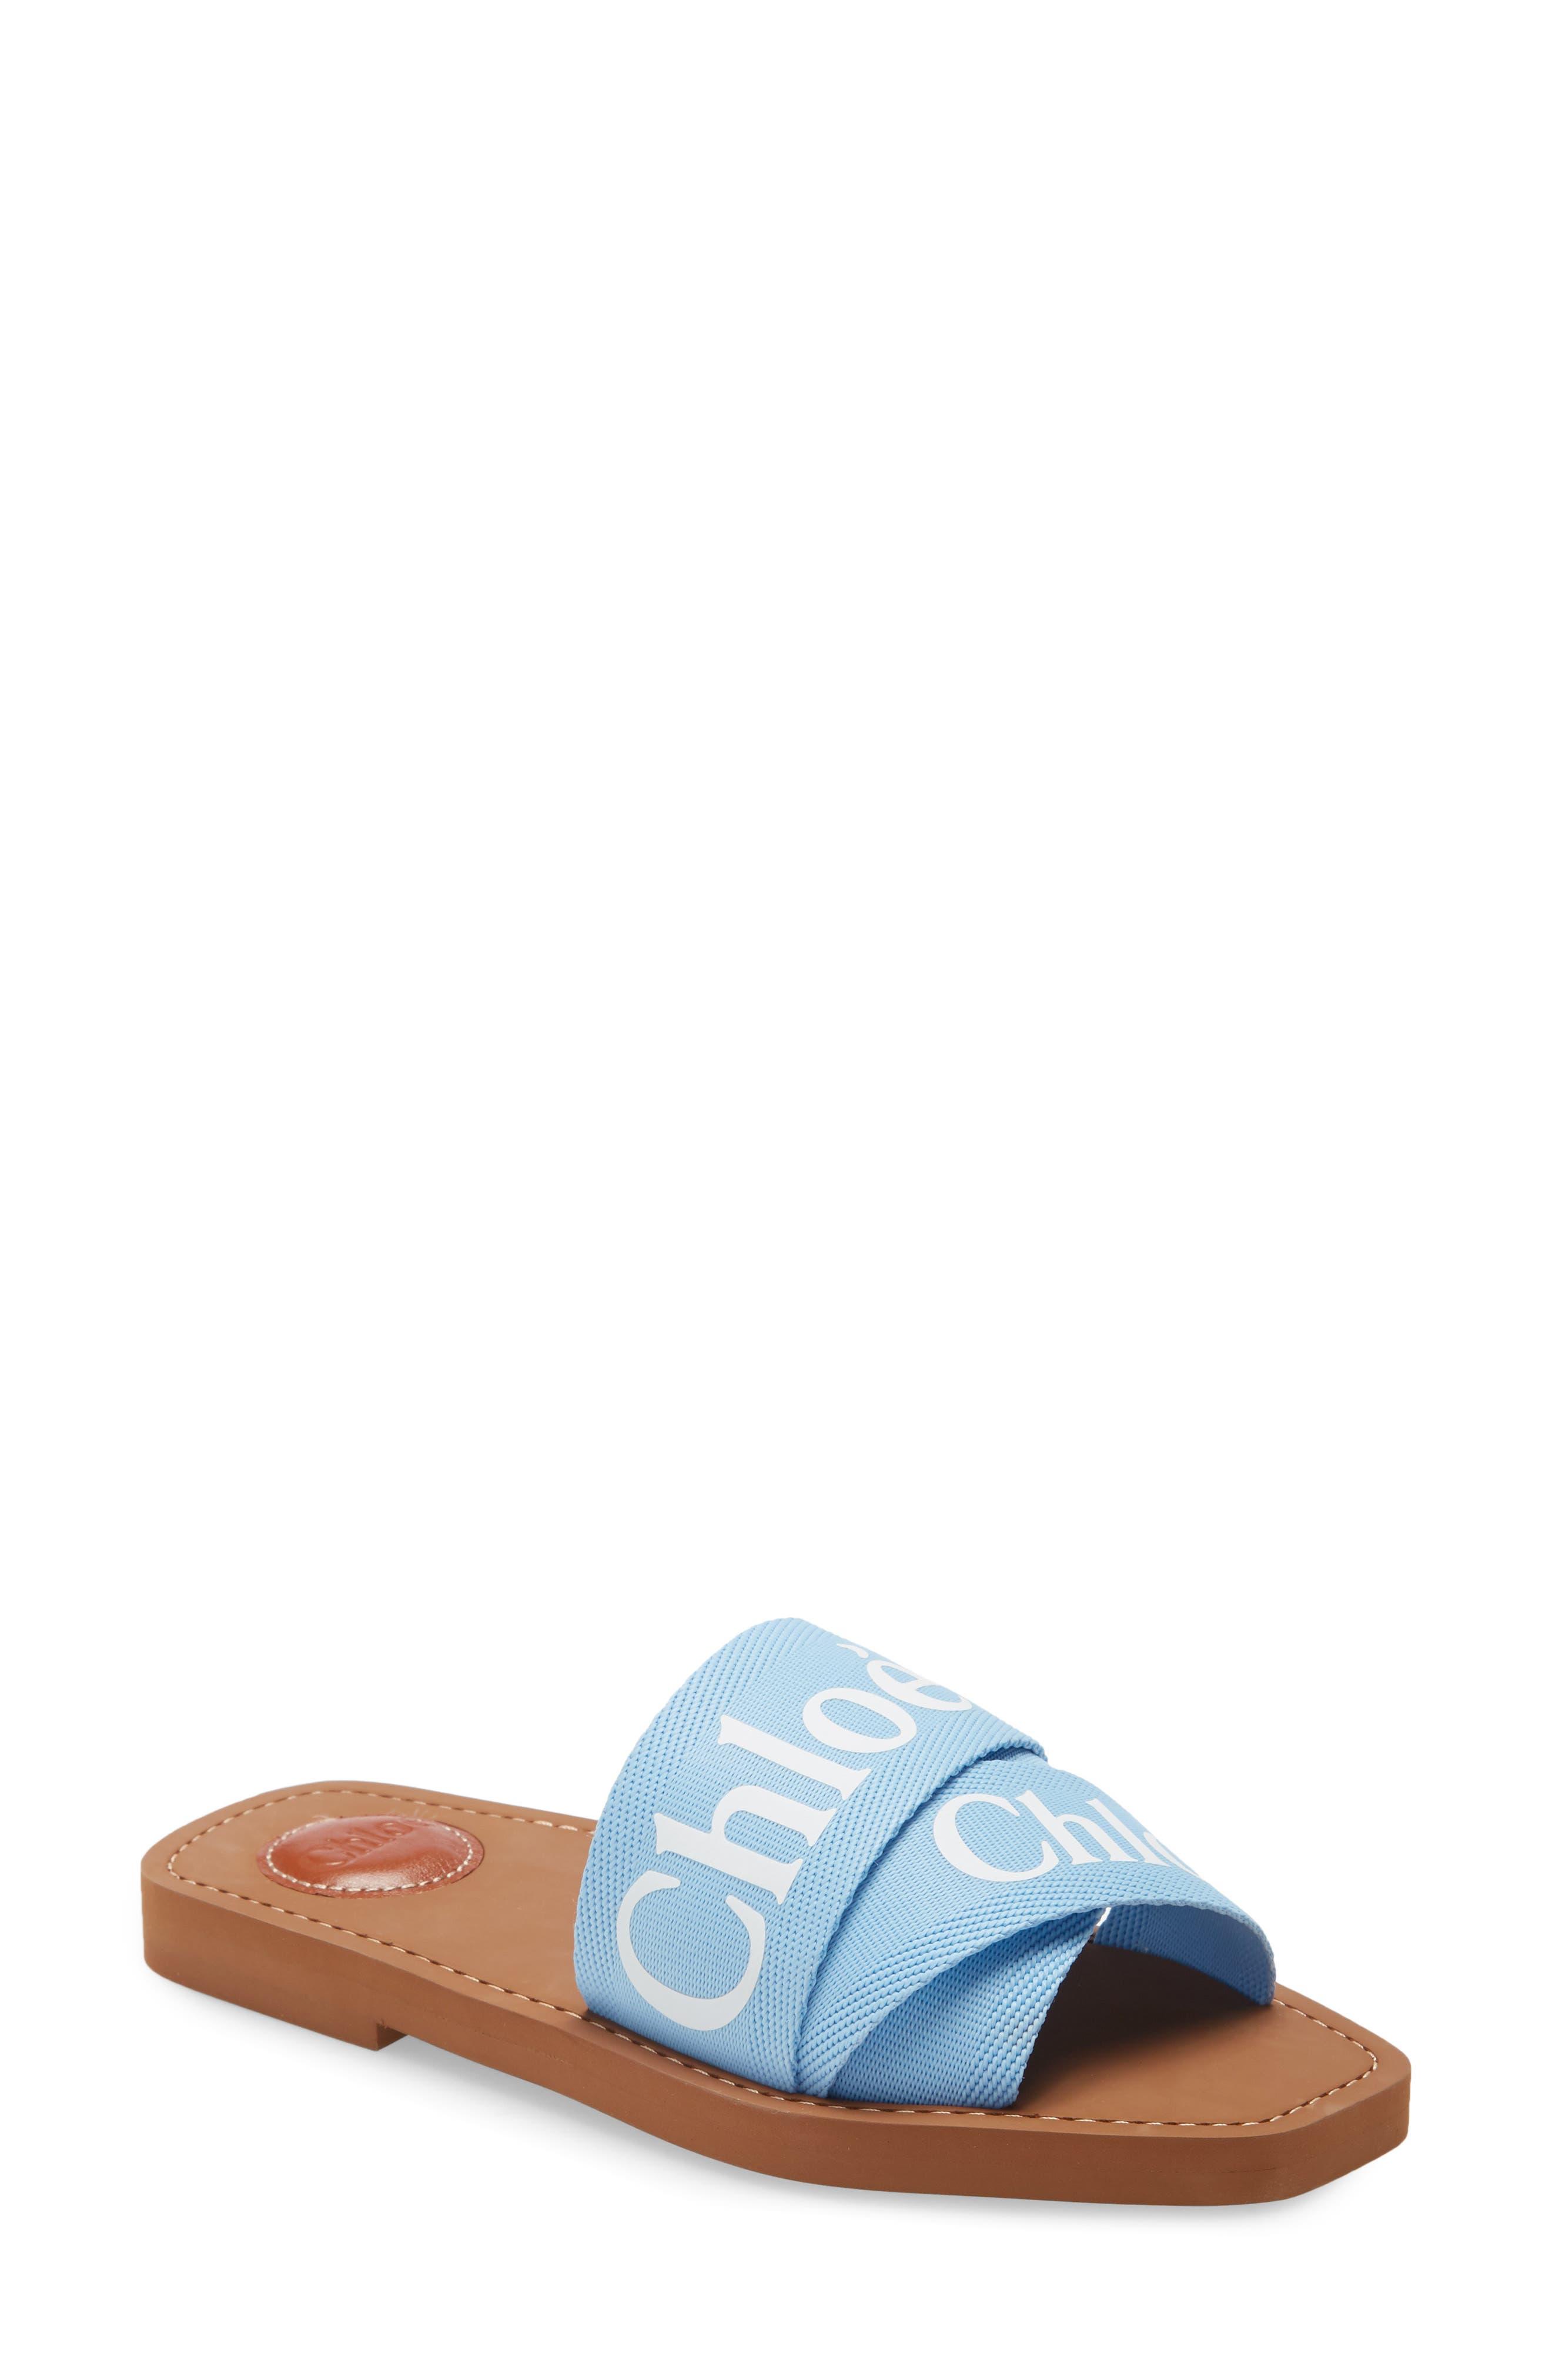 Women's Chloé Sandals and Flip-Flops